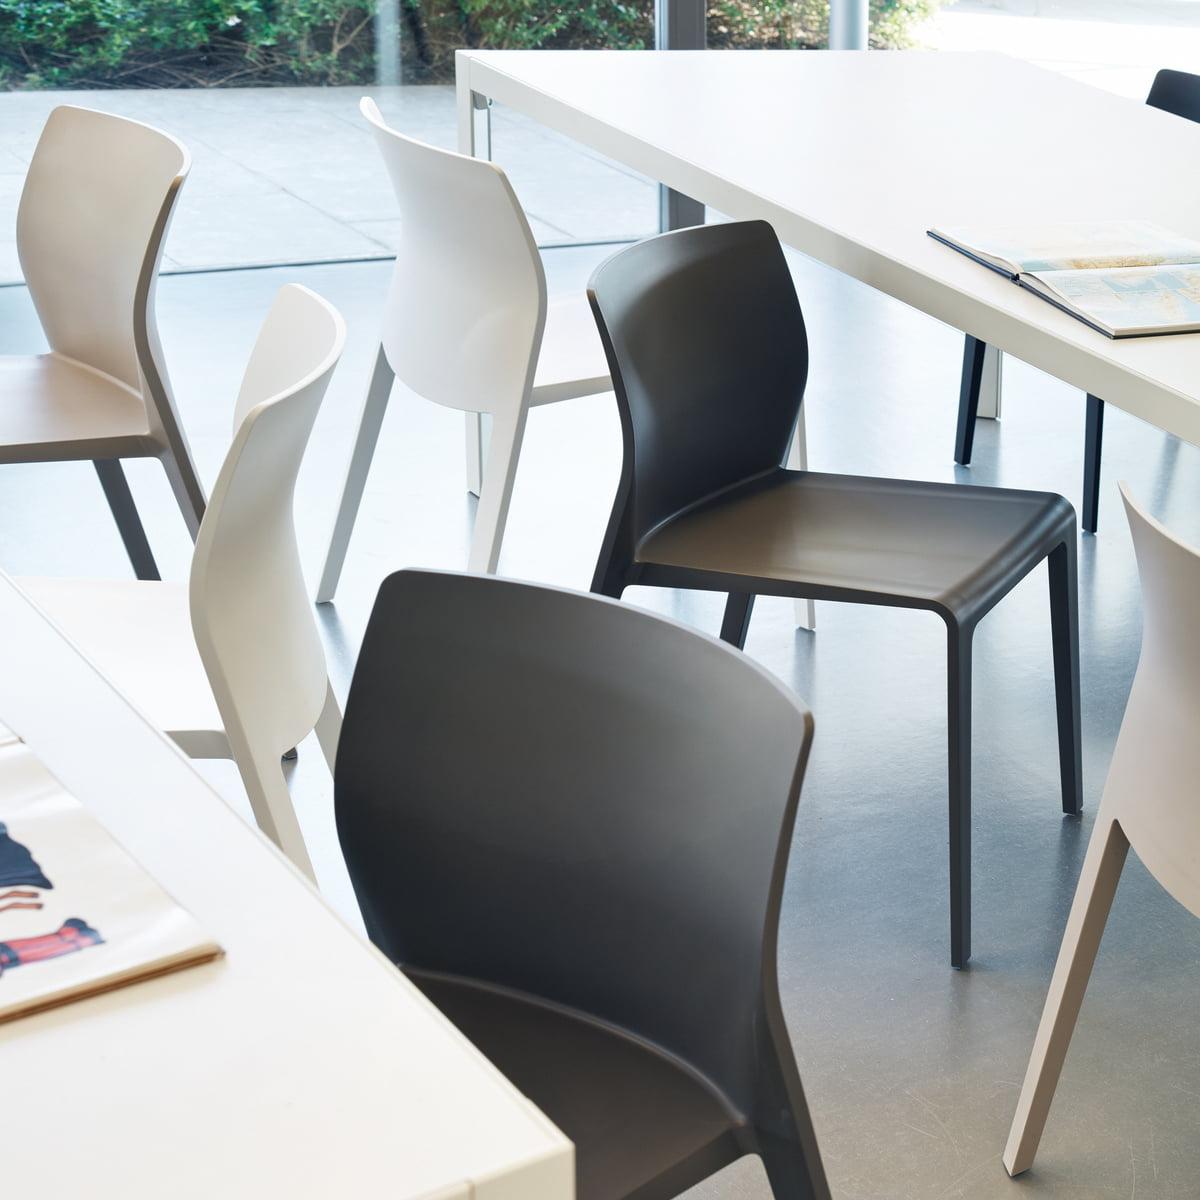 juno chair by arper in our interior design shop - arper  juno chair